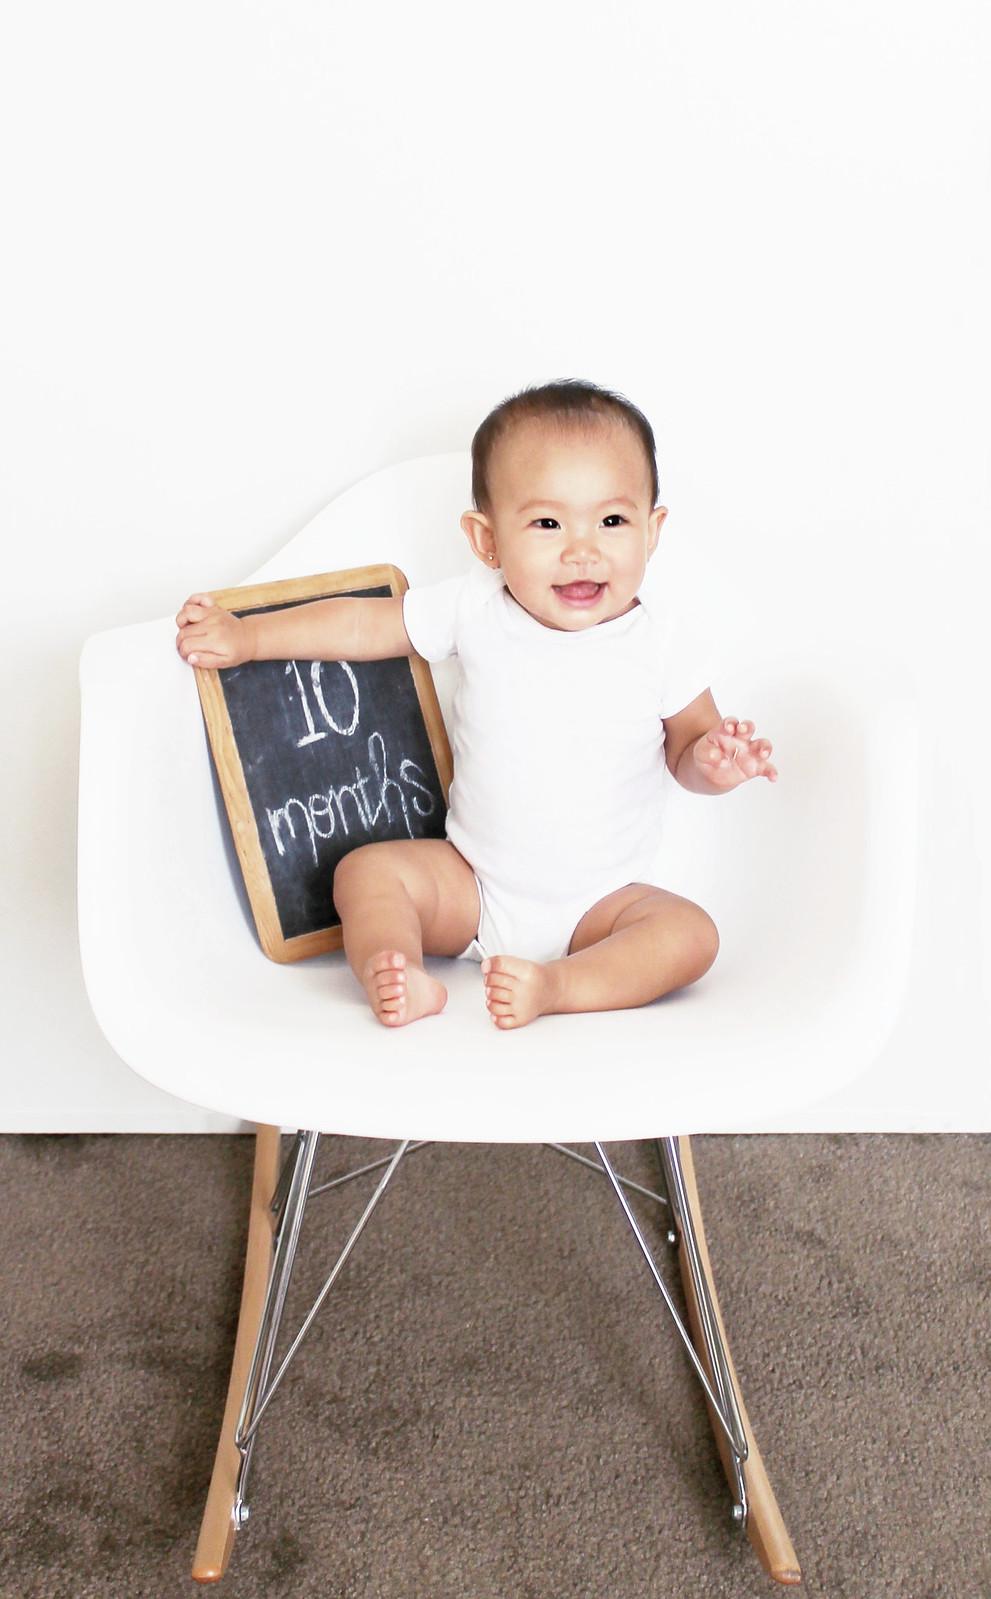 serene joy at 10 months